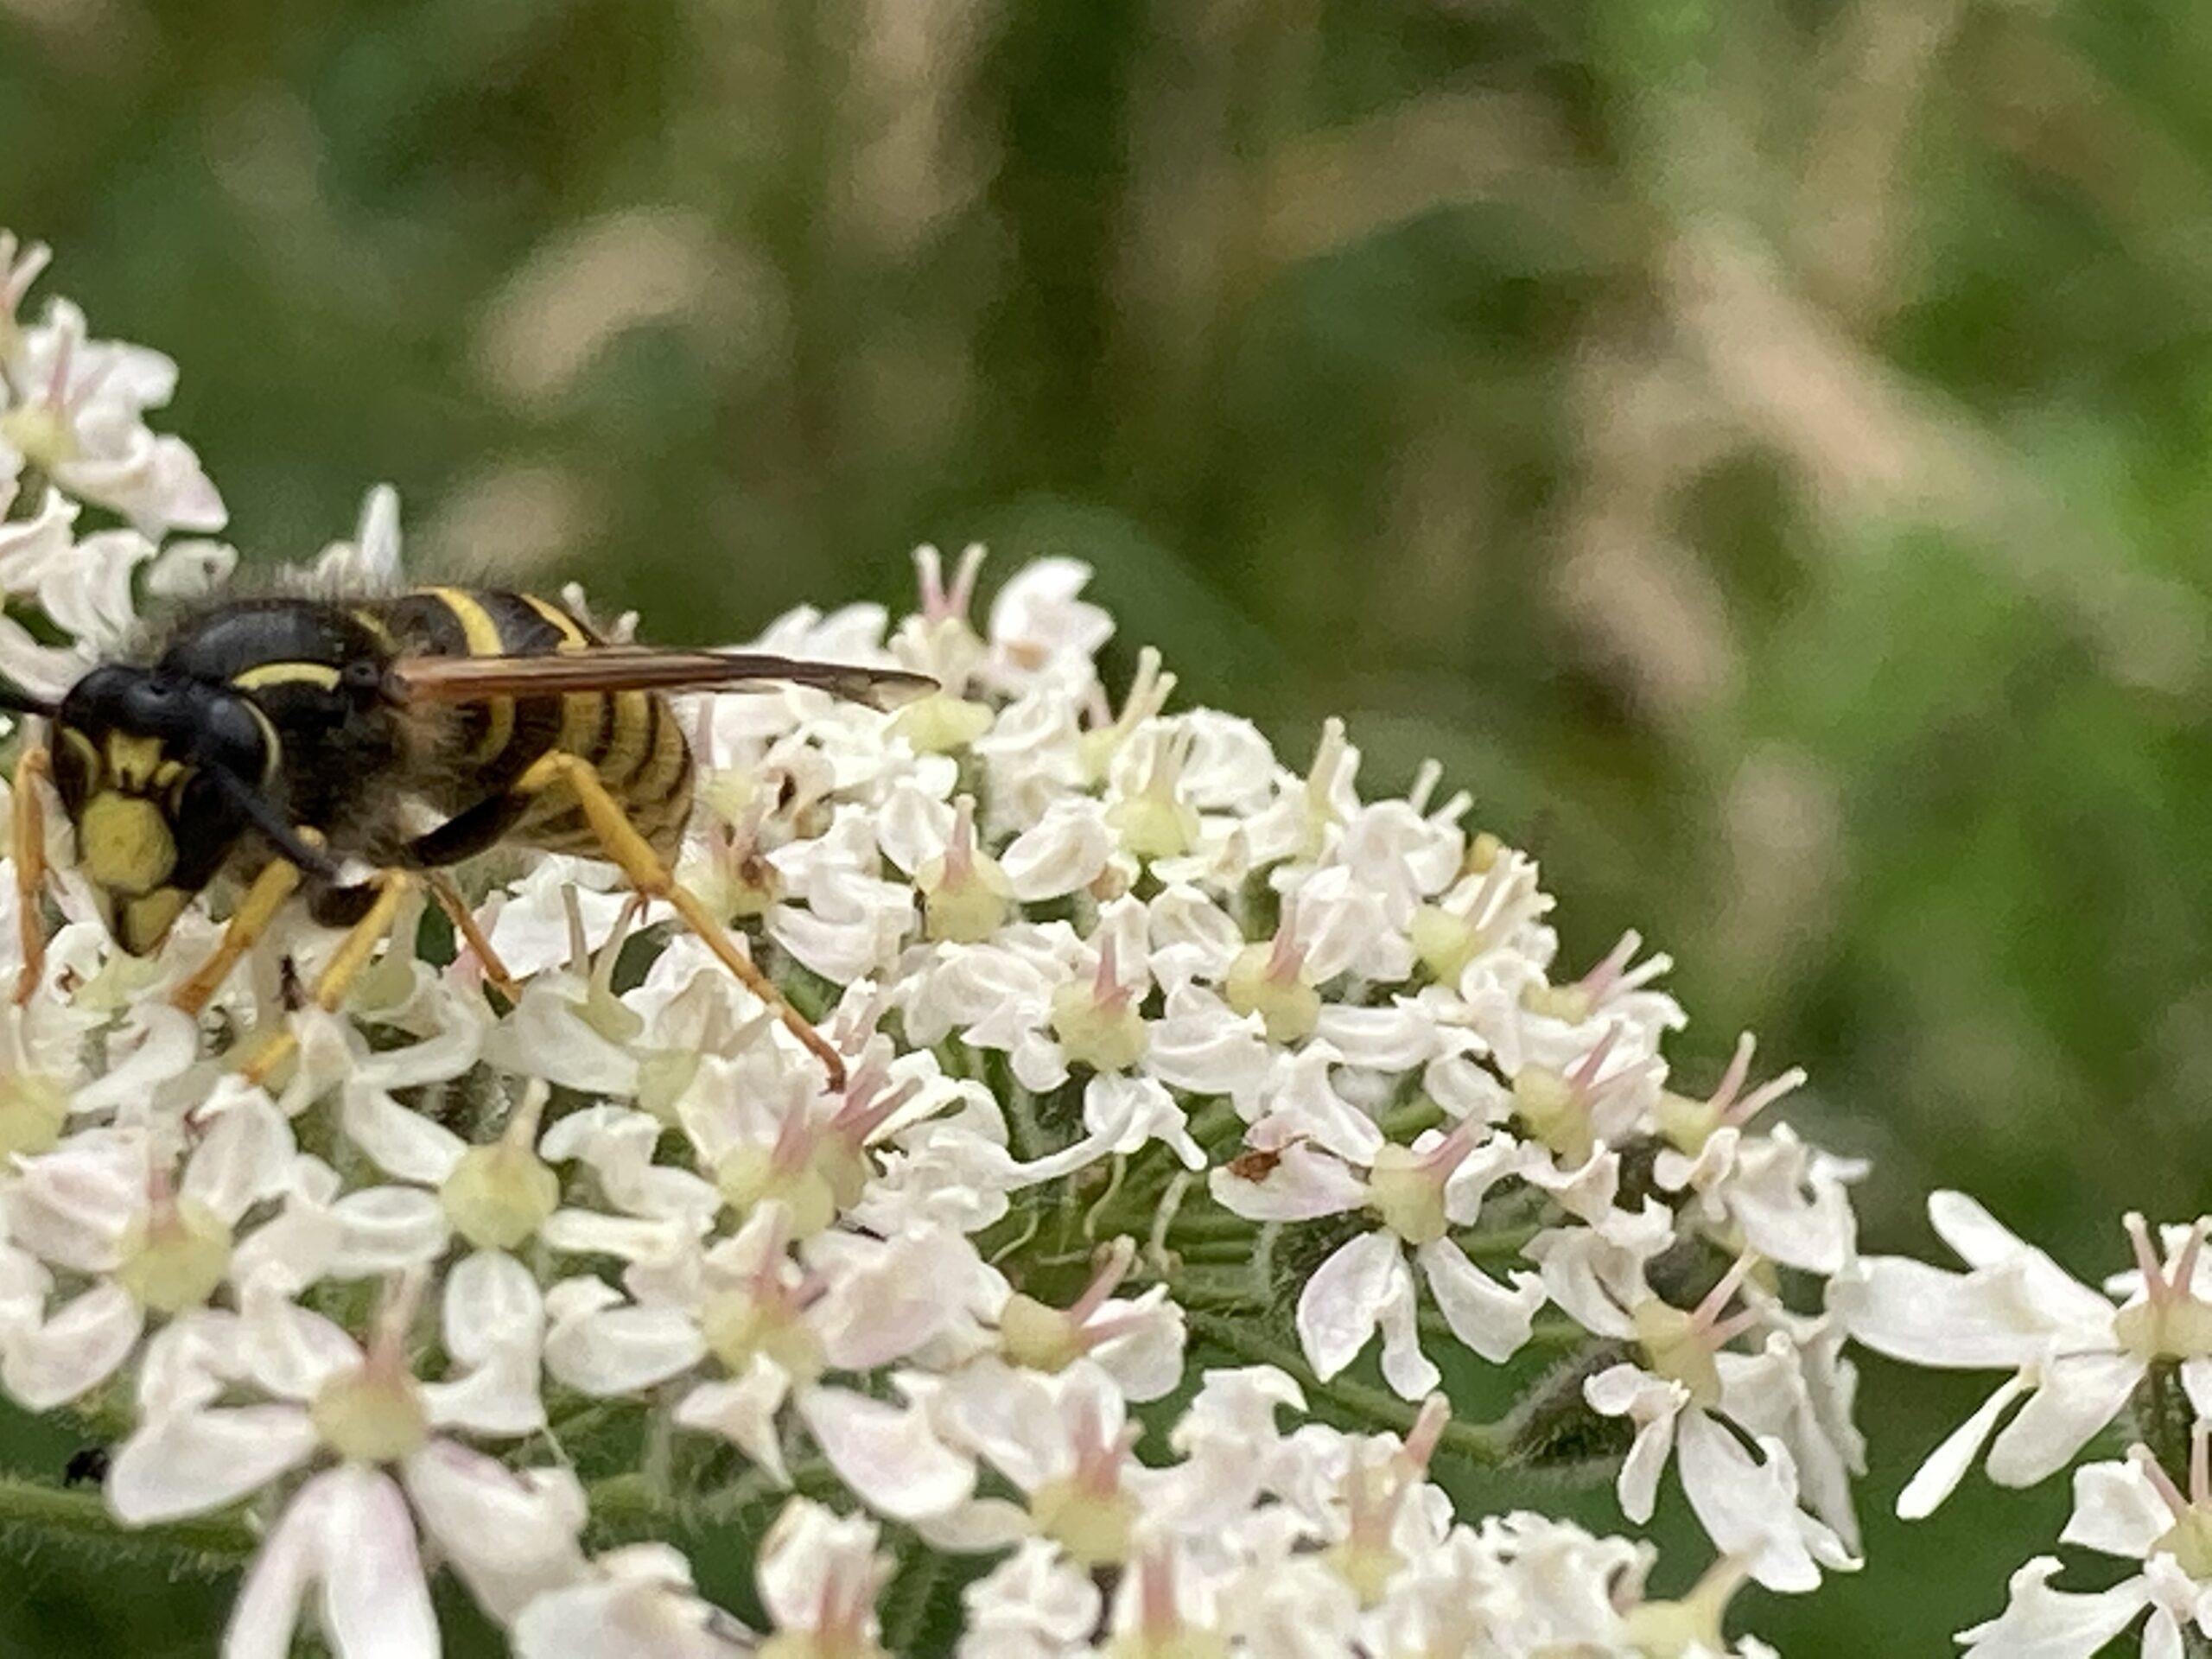 'Tree wasp' - Dolichovespula sylvestric